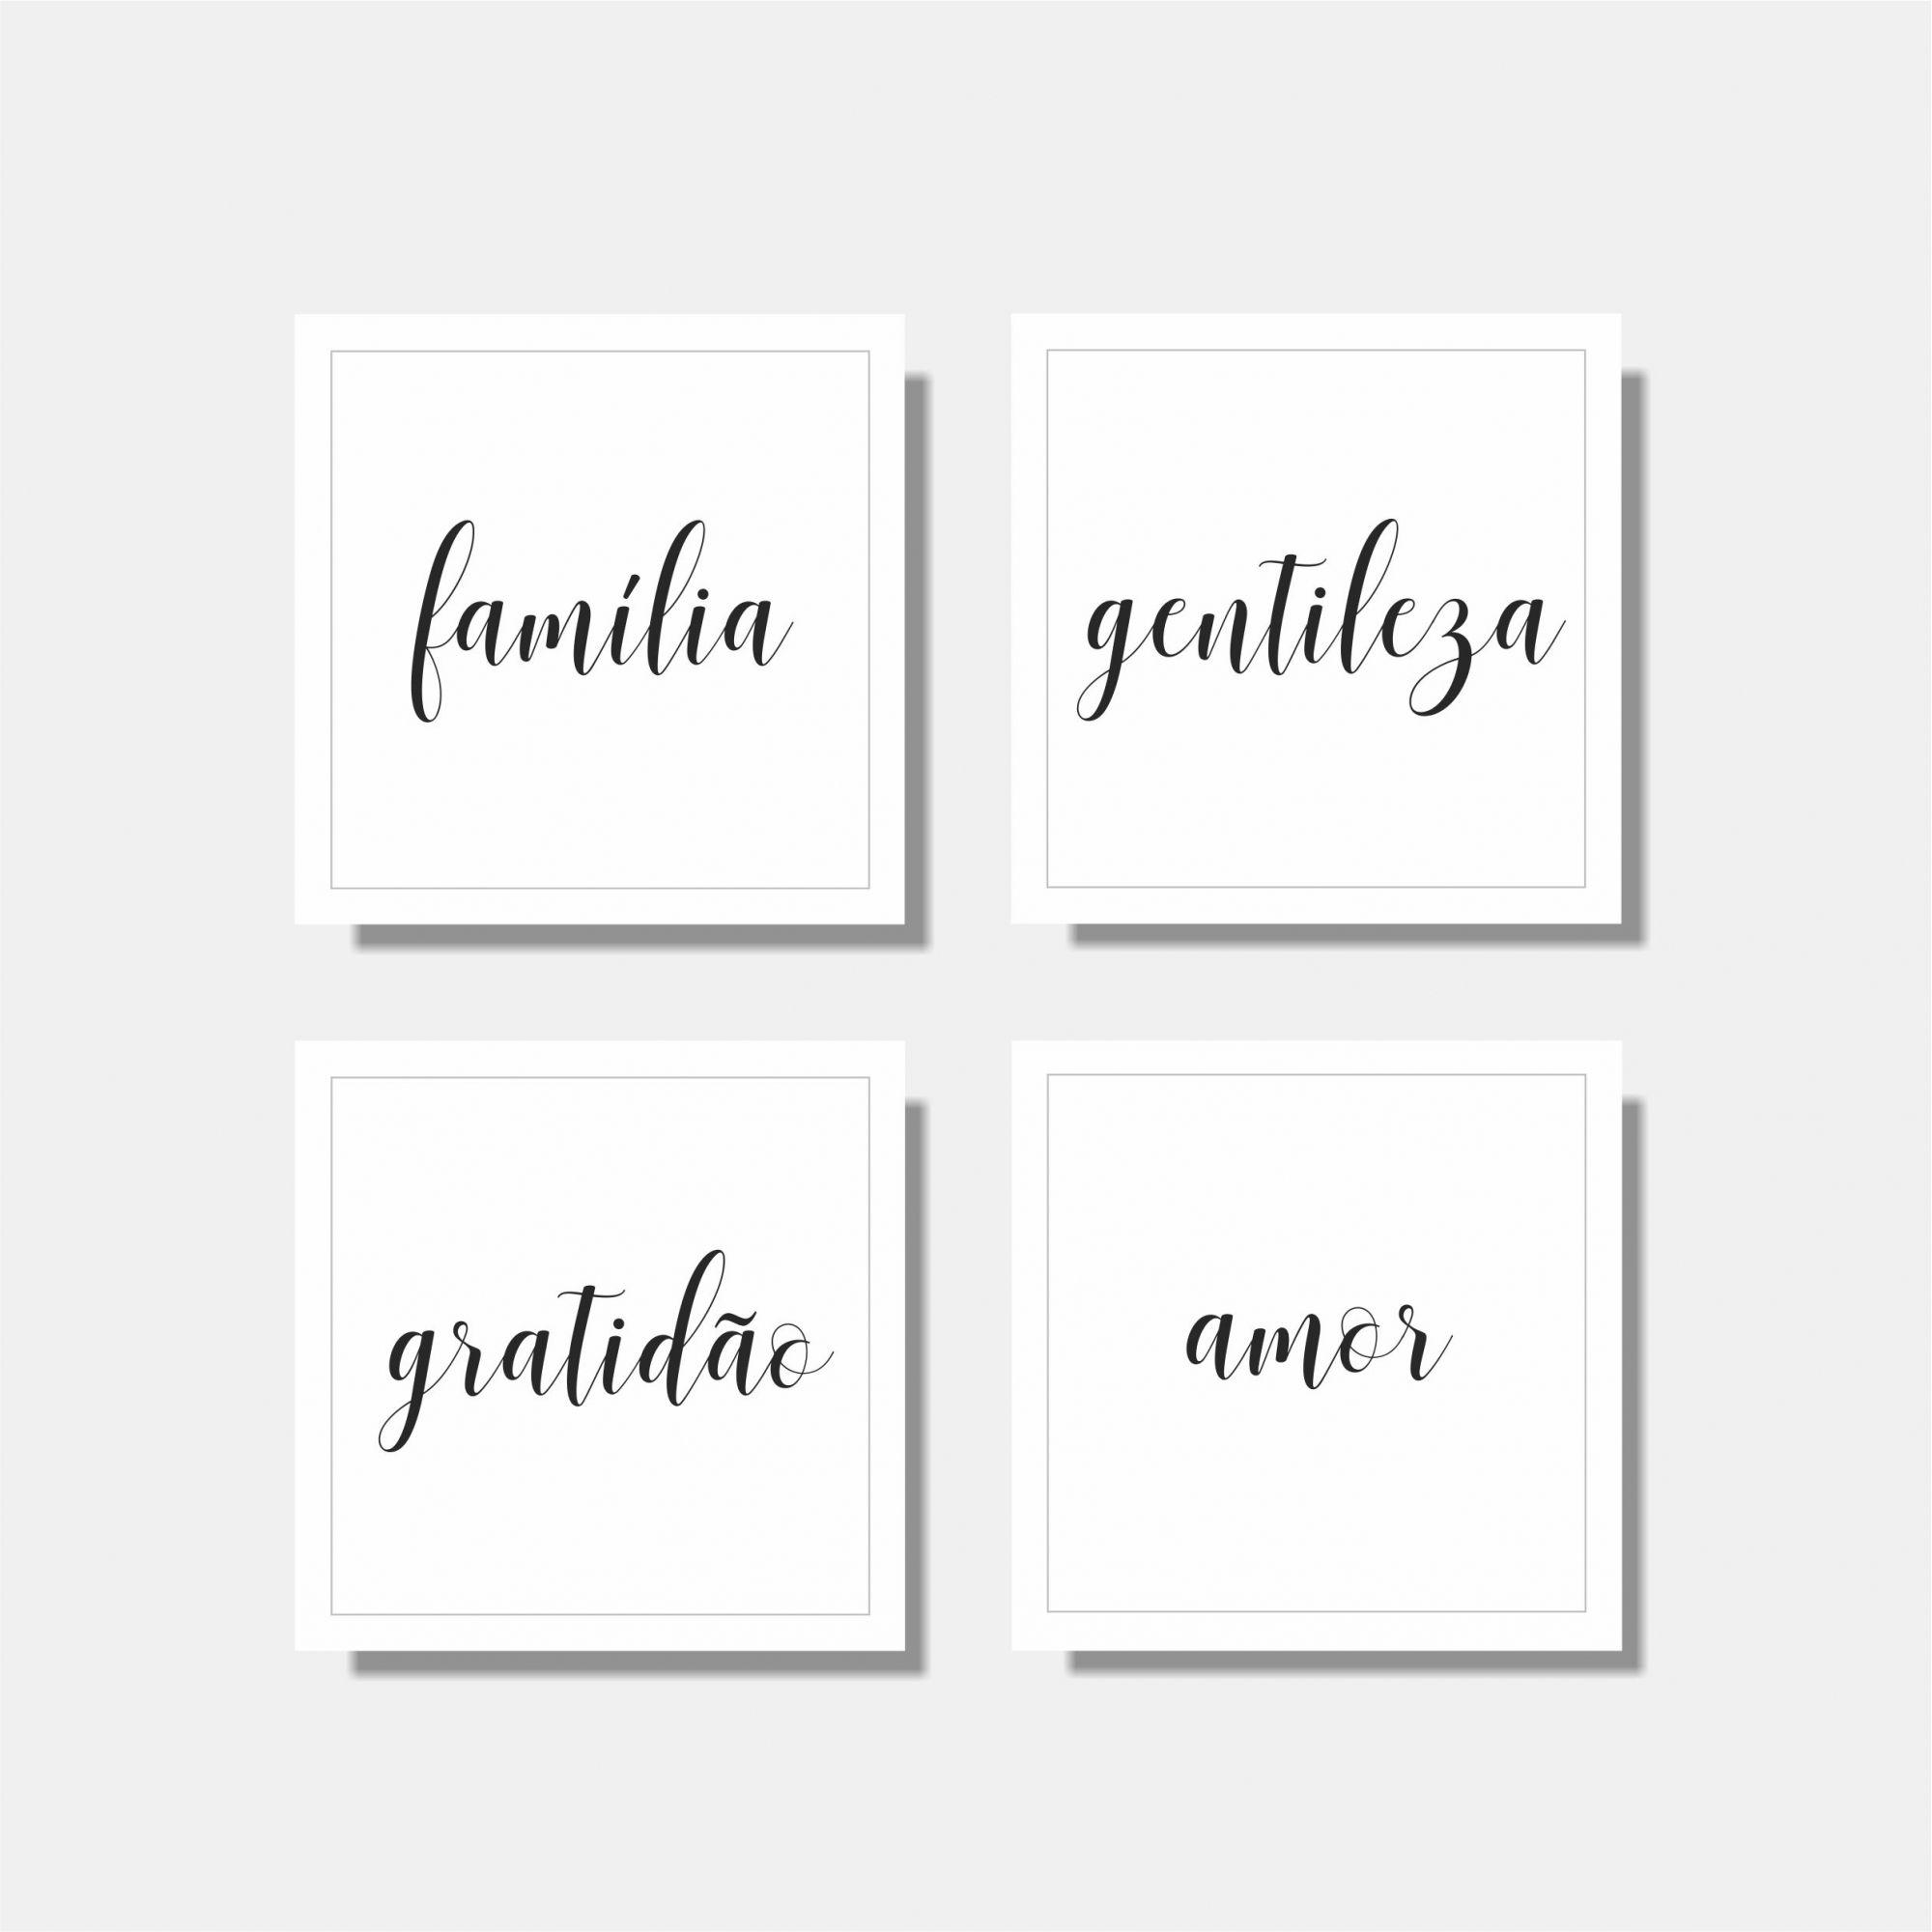 Kit Família + Gentileza + Gratidão + Amor